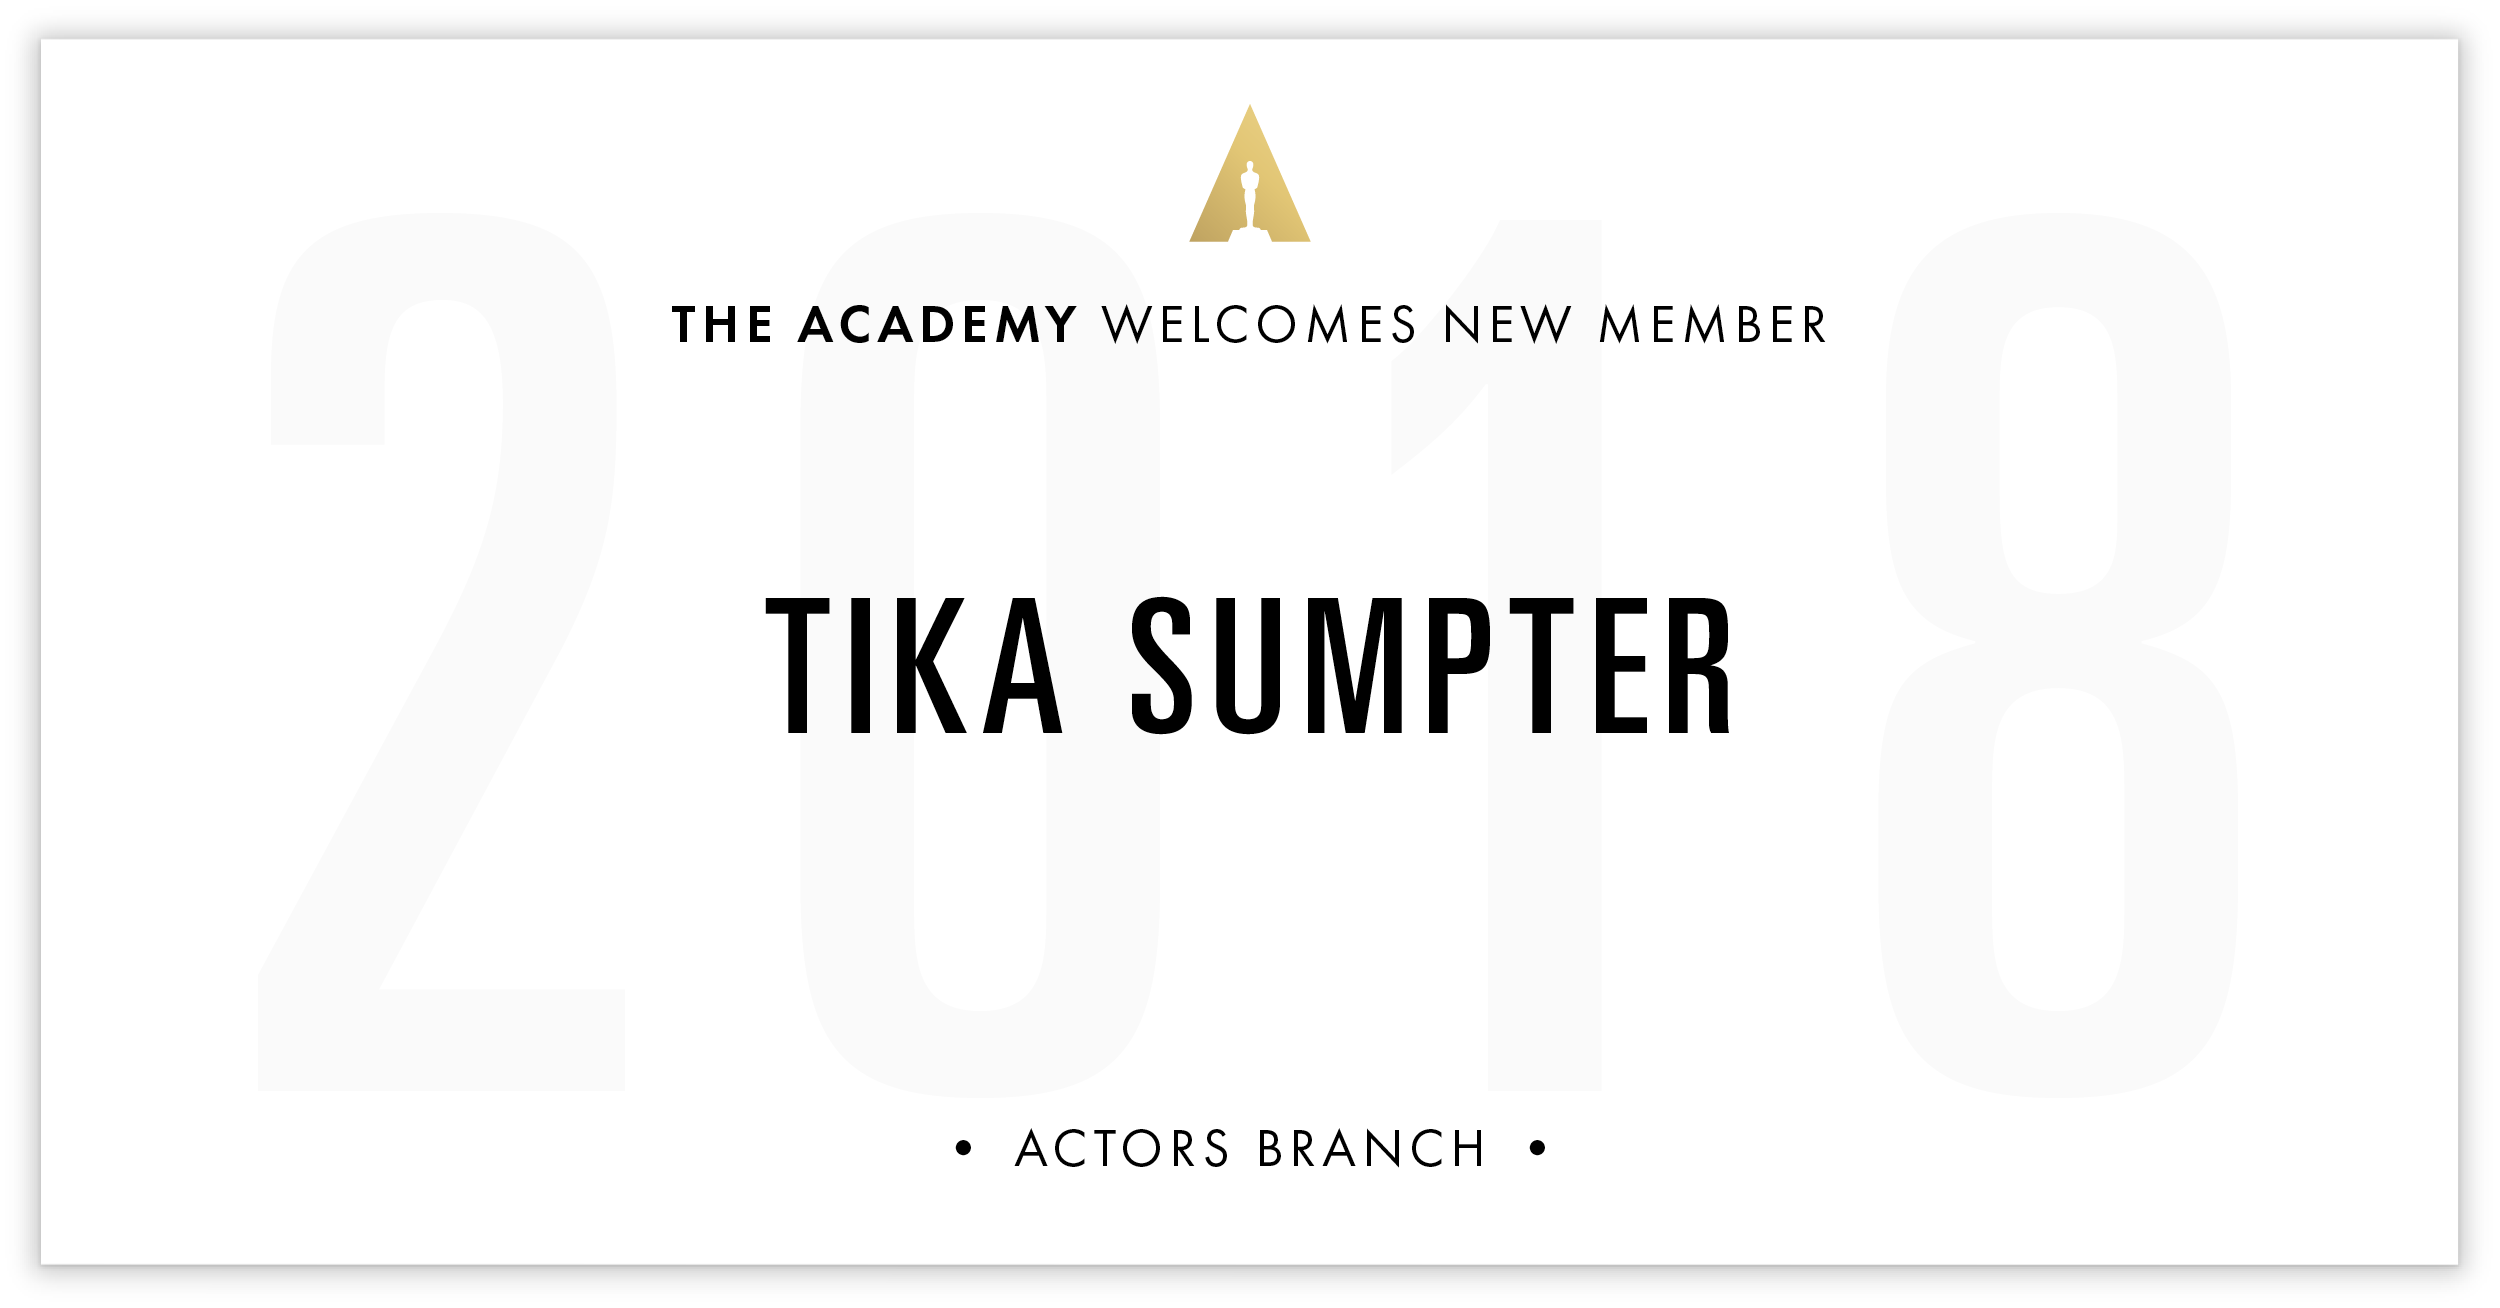 Tika Sumpter is invited!